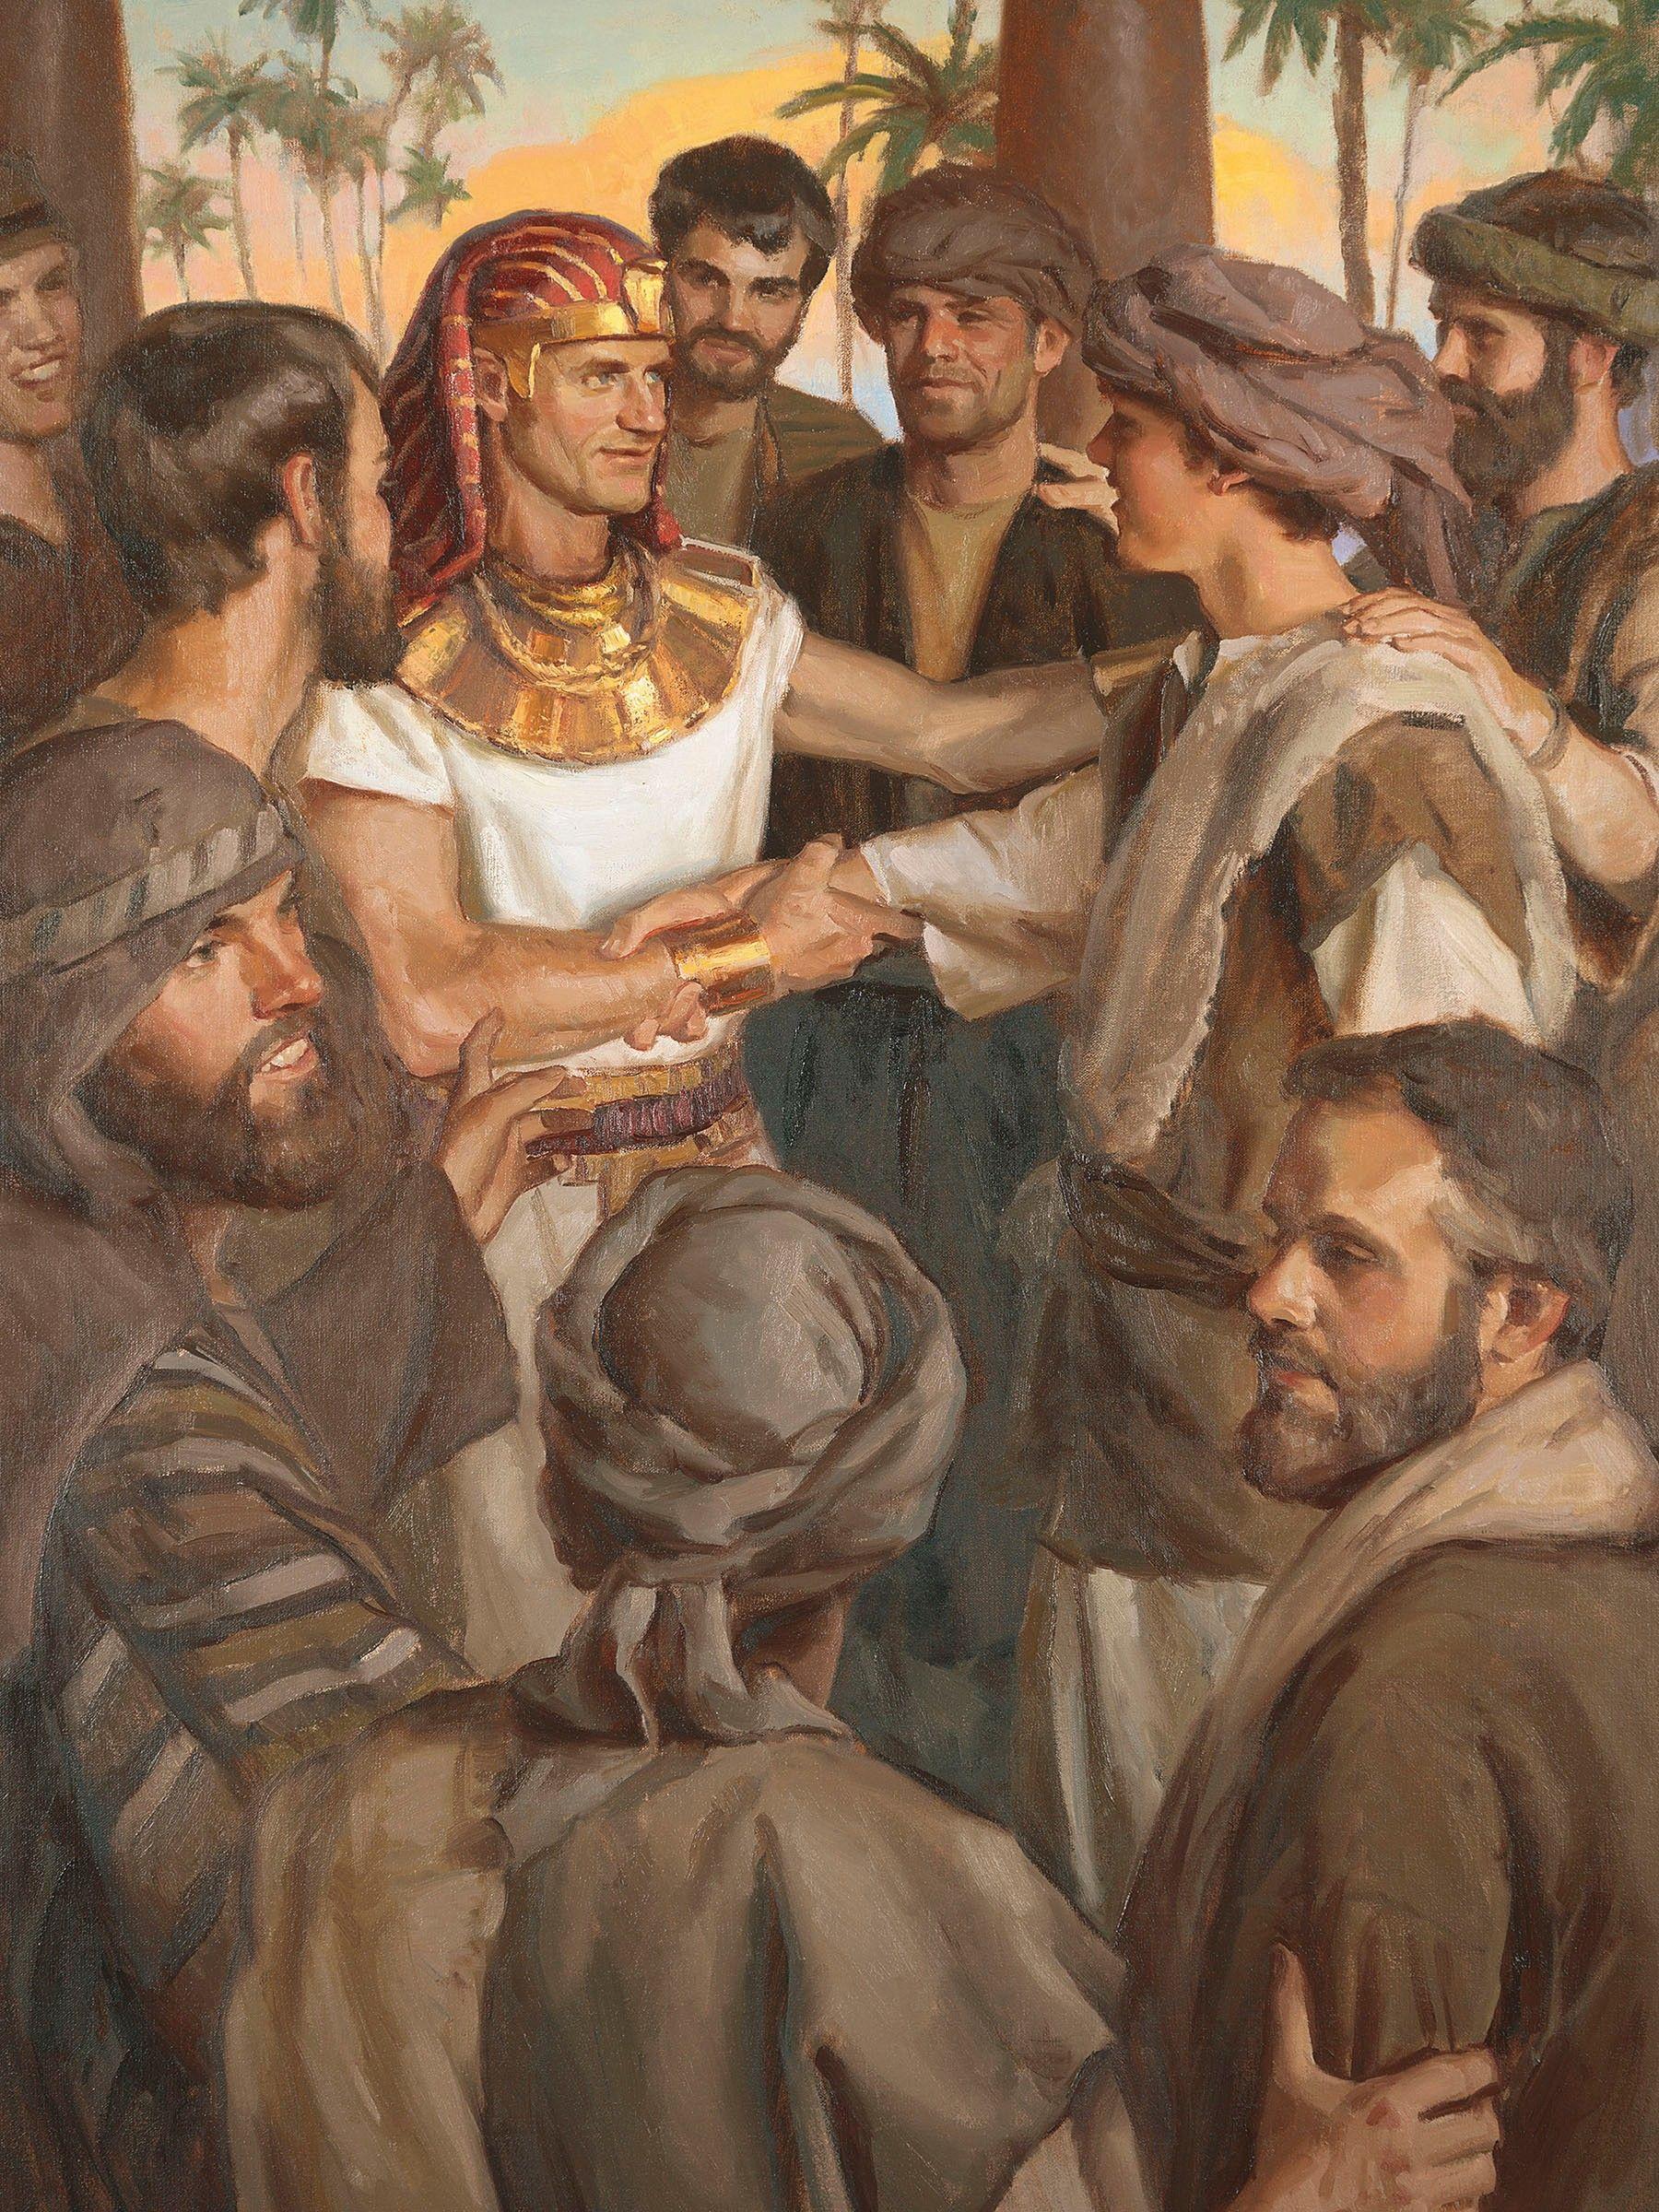 Joseph of Egypt, by Michael T. Malm